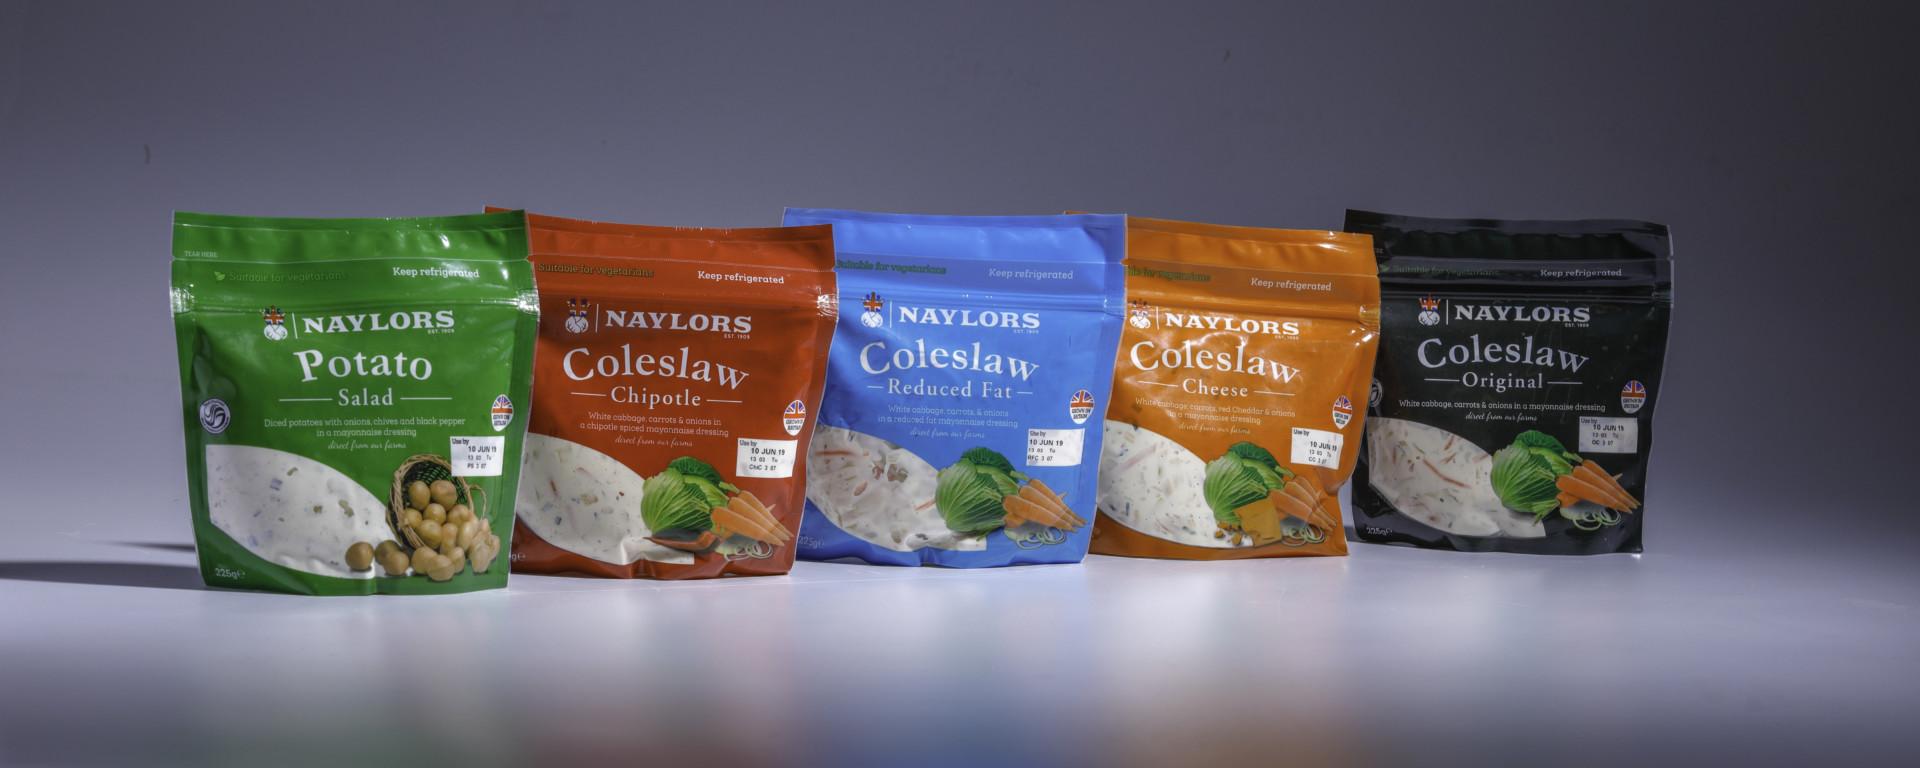 Einfacher geht's nicht: Naylor Farms' servierfertiger Krautsalat im wiederverschliessbaren Schur®Star Standbodenbeutel